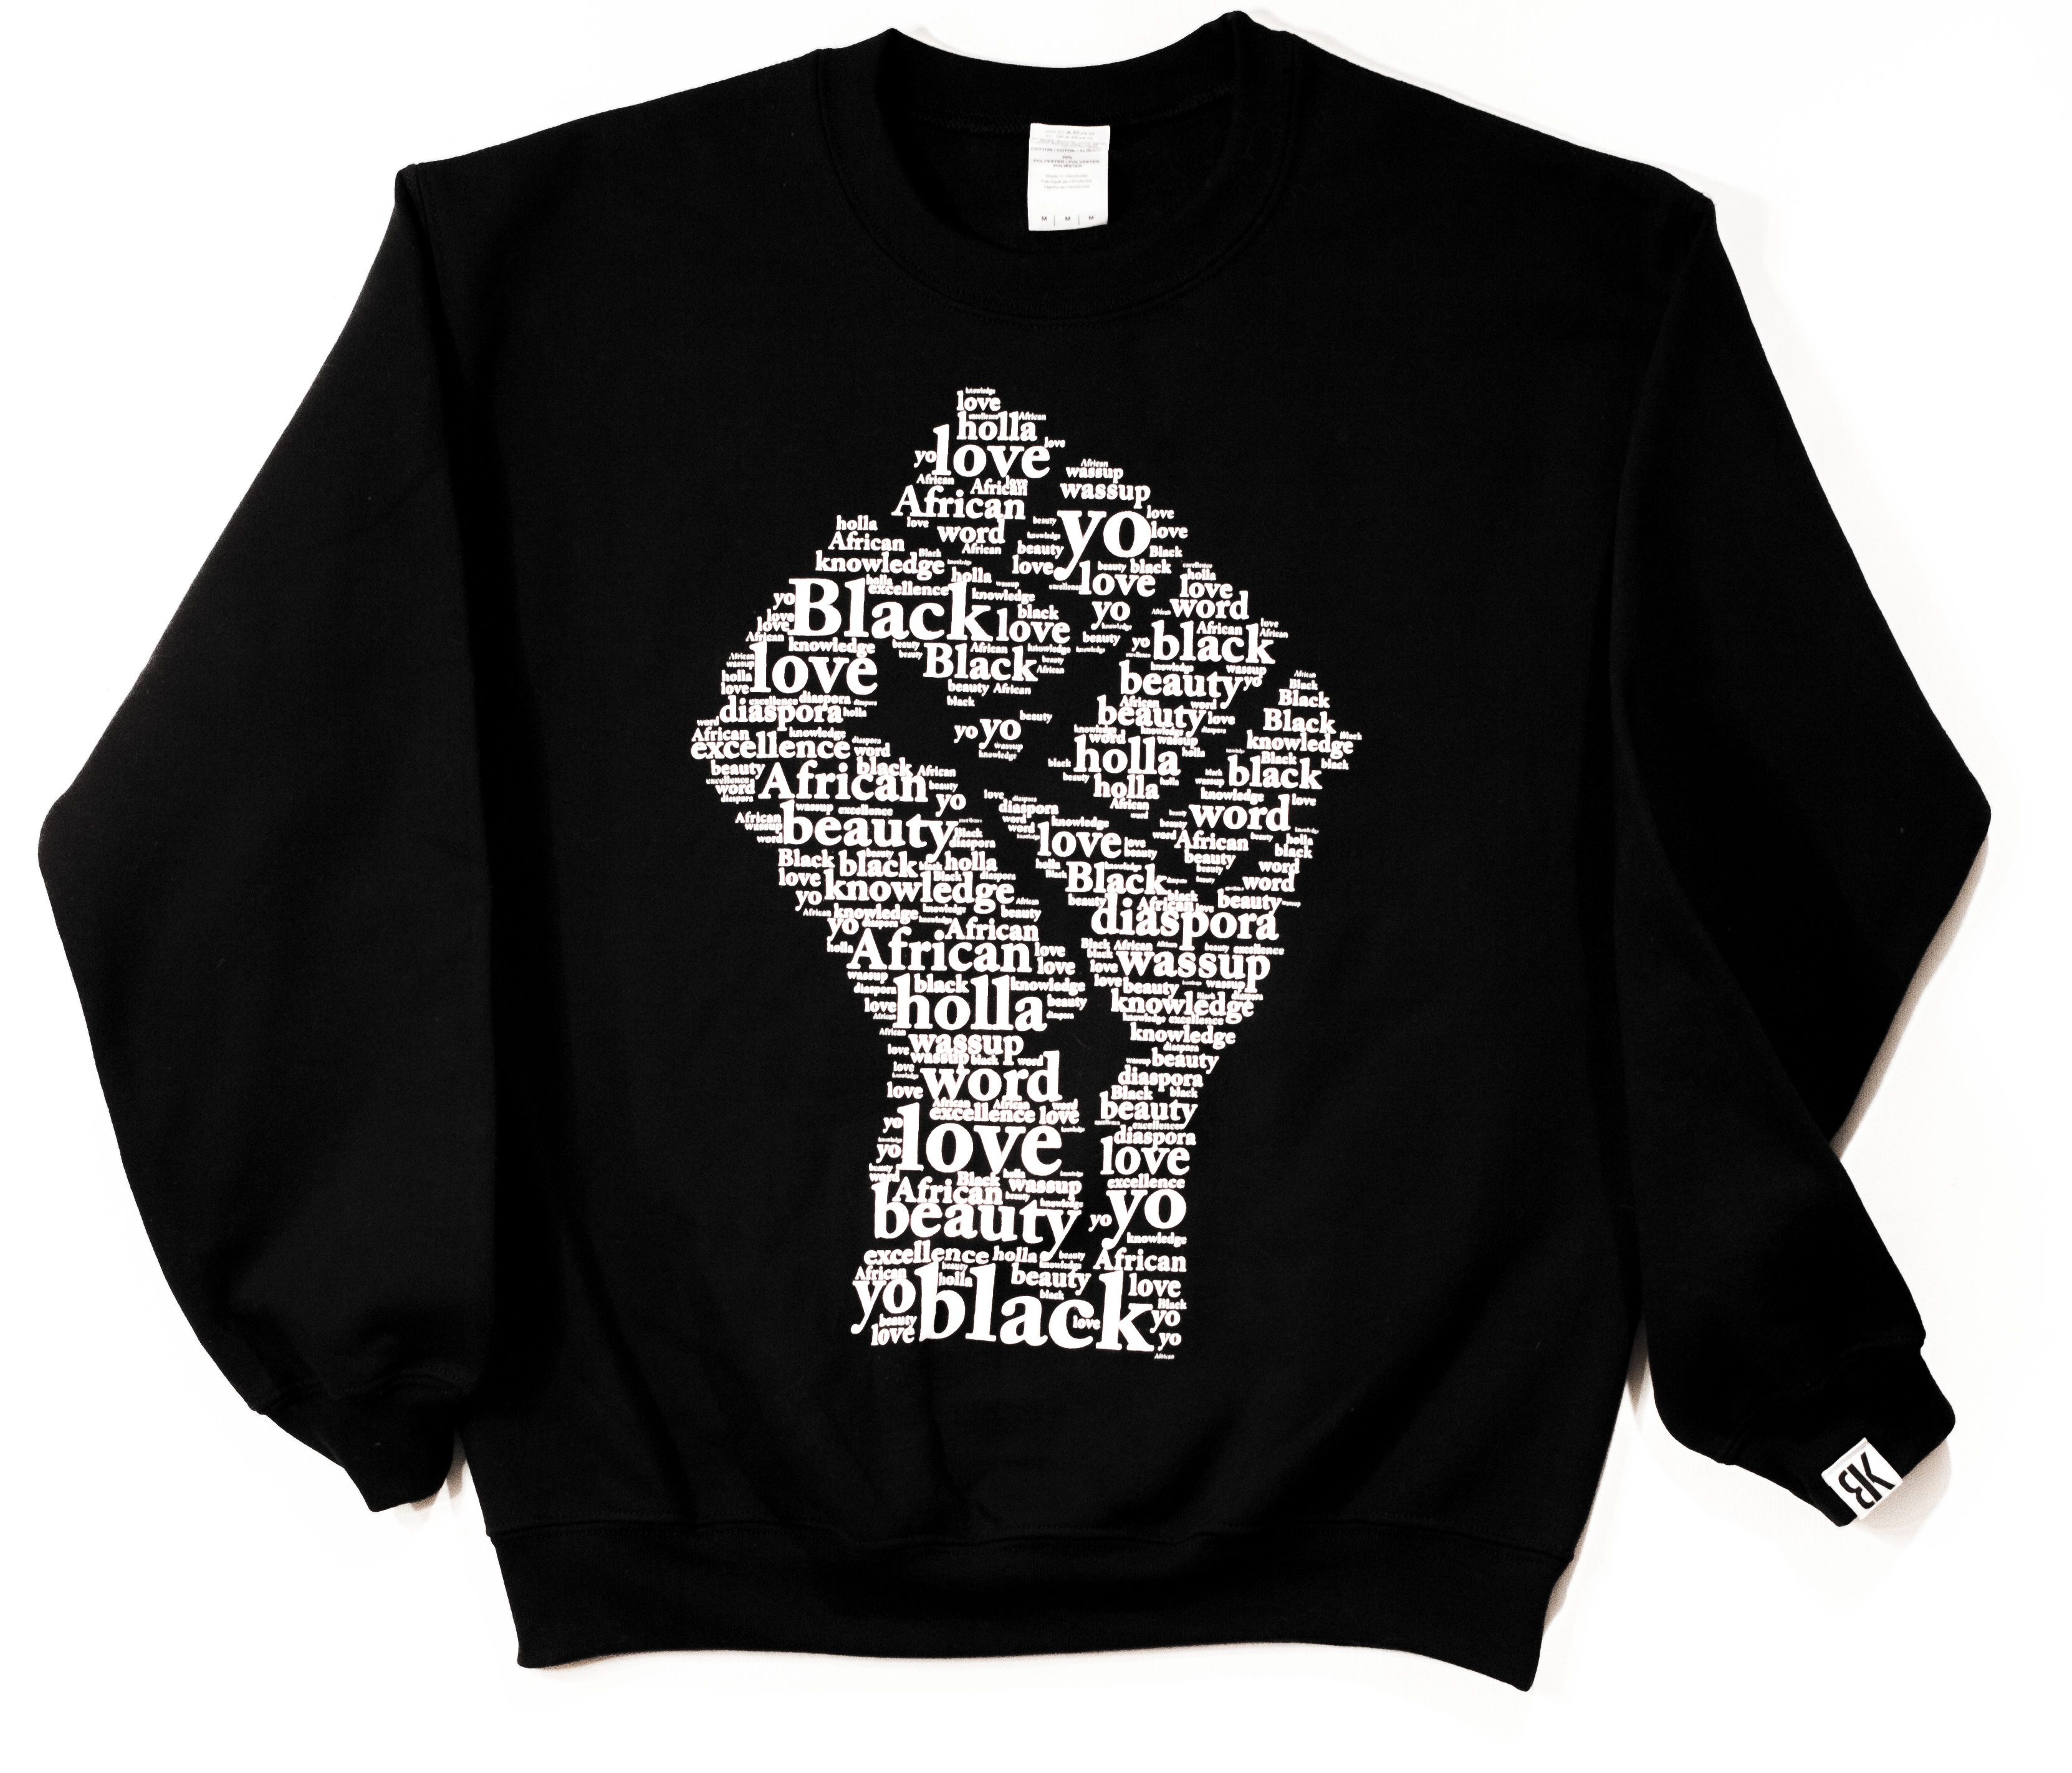 sweatshirt, with black power fist Sweatshirts, Black